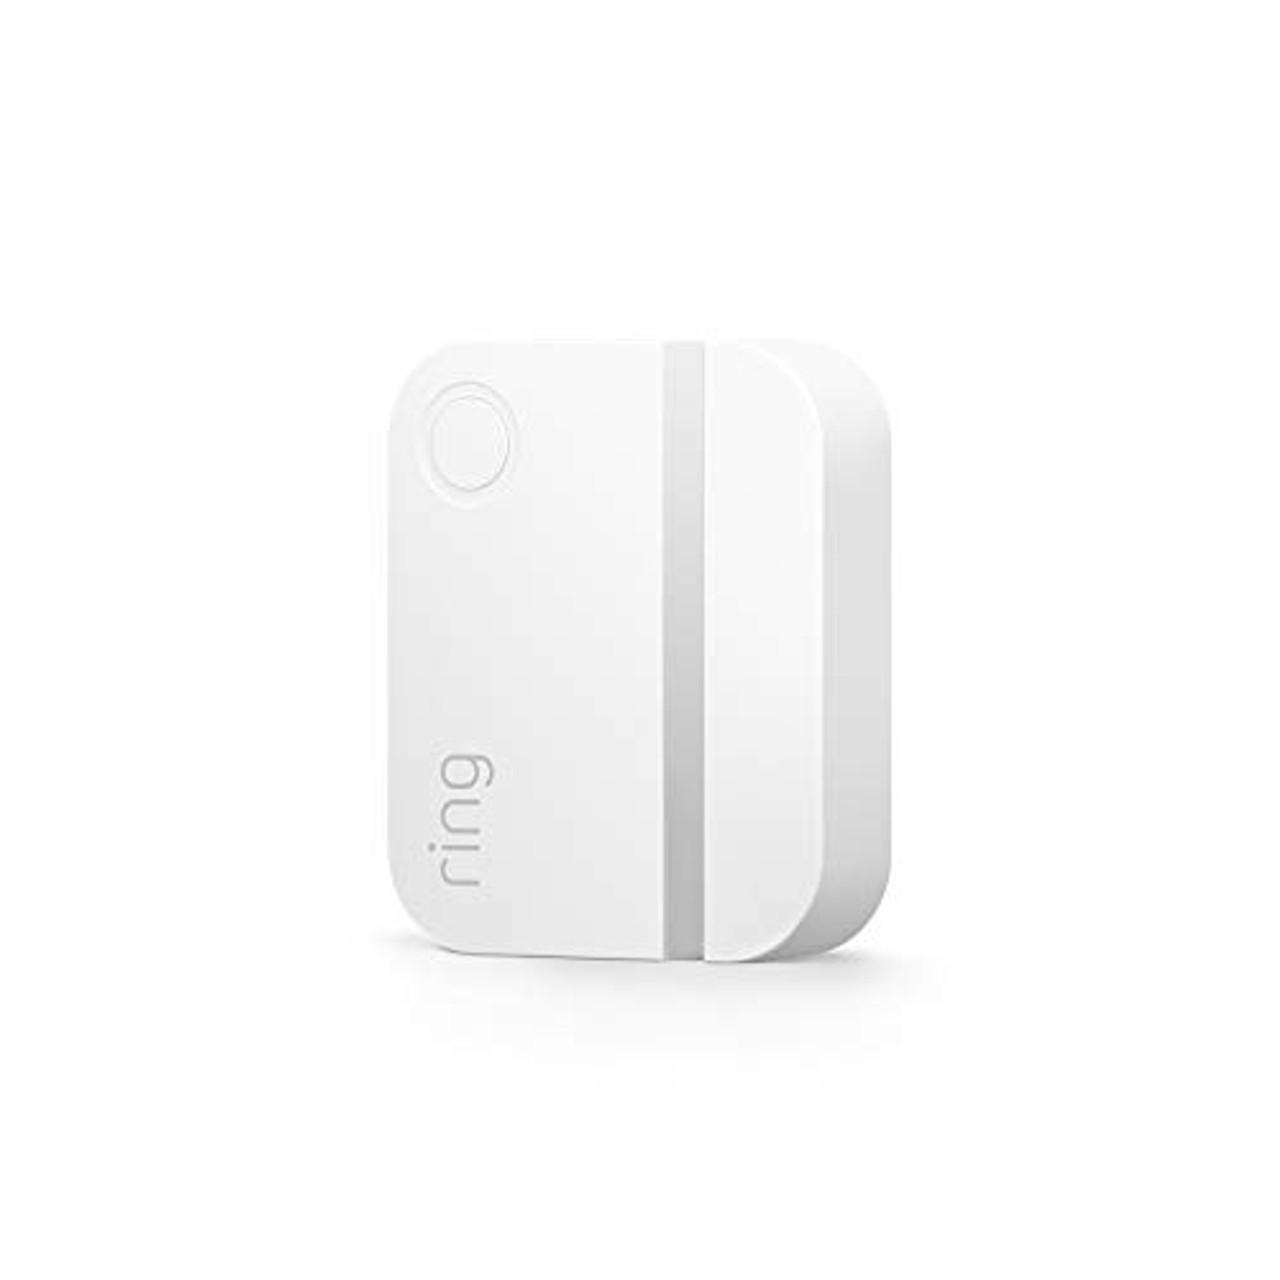 All-new Ring Alarm Contact Sensor (2nd Gen)